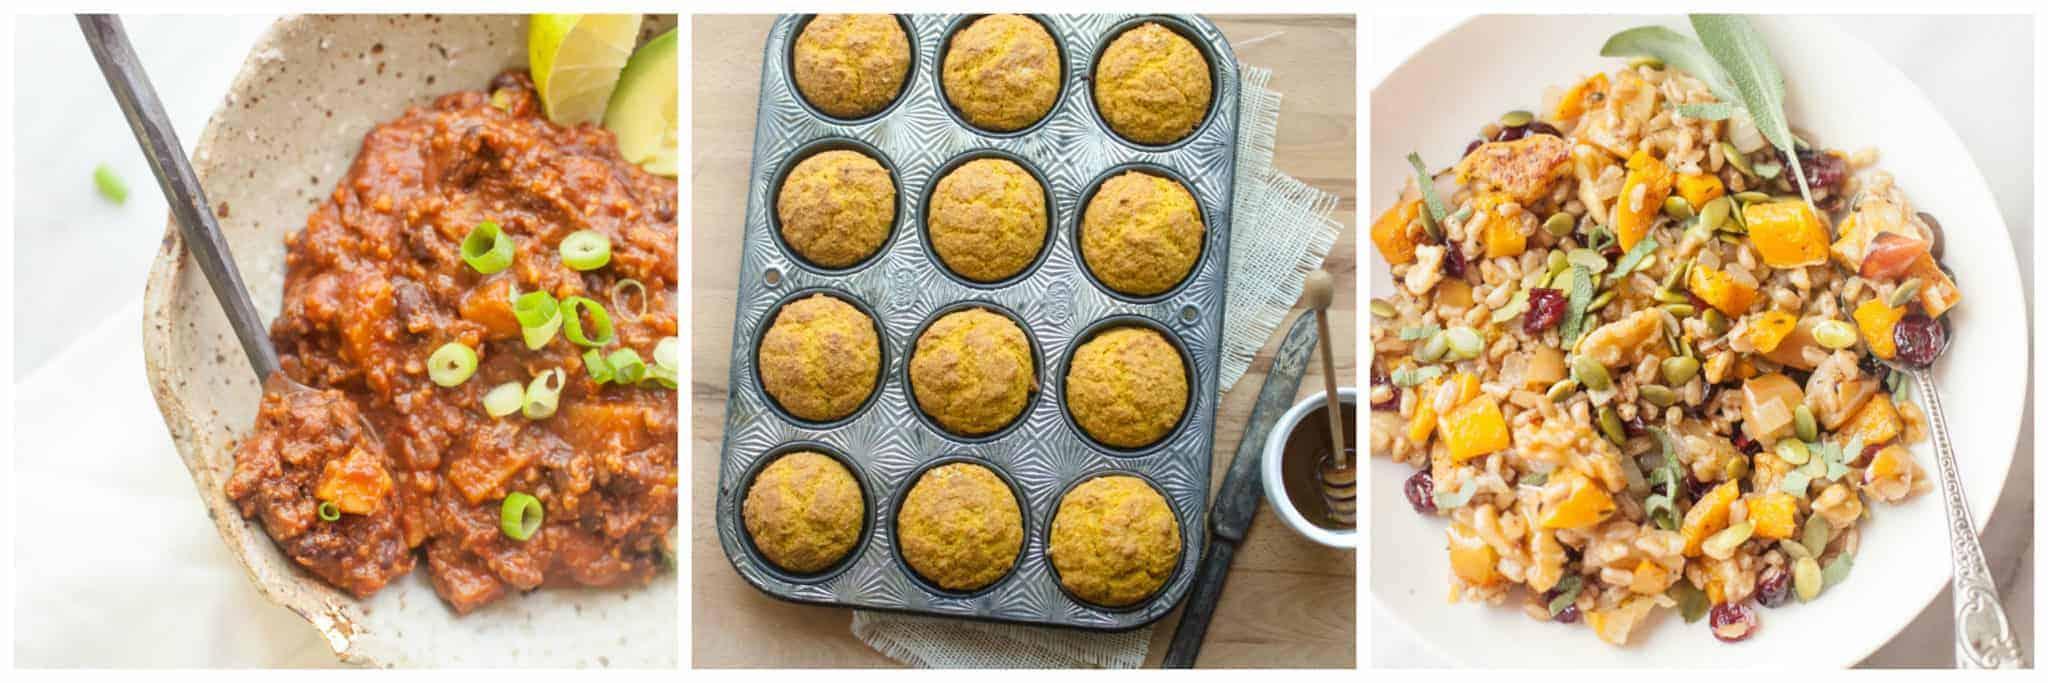 40 Sweet and Savory Pumpkin Recipes- lots of healthy pumpkin recipes too!